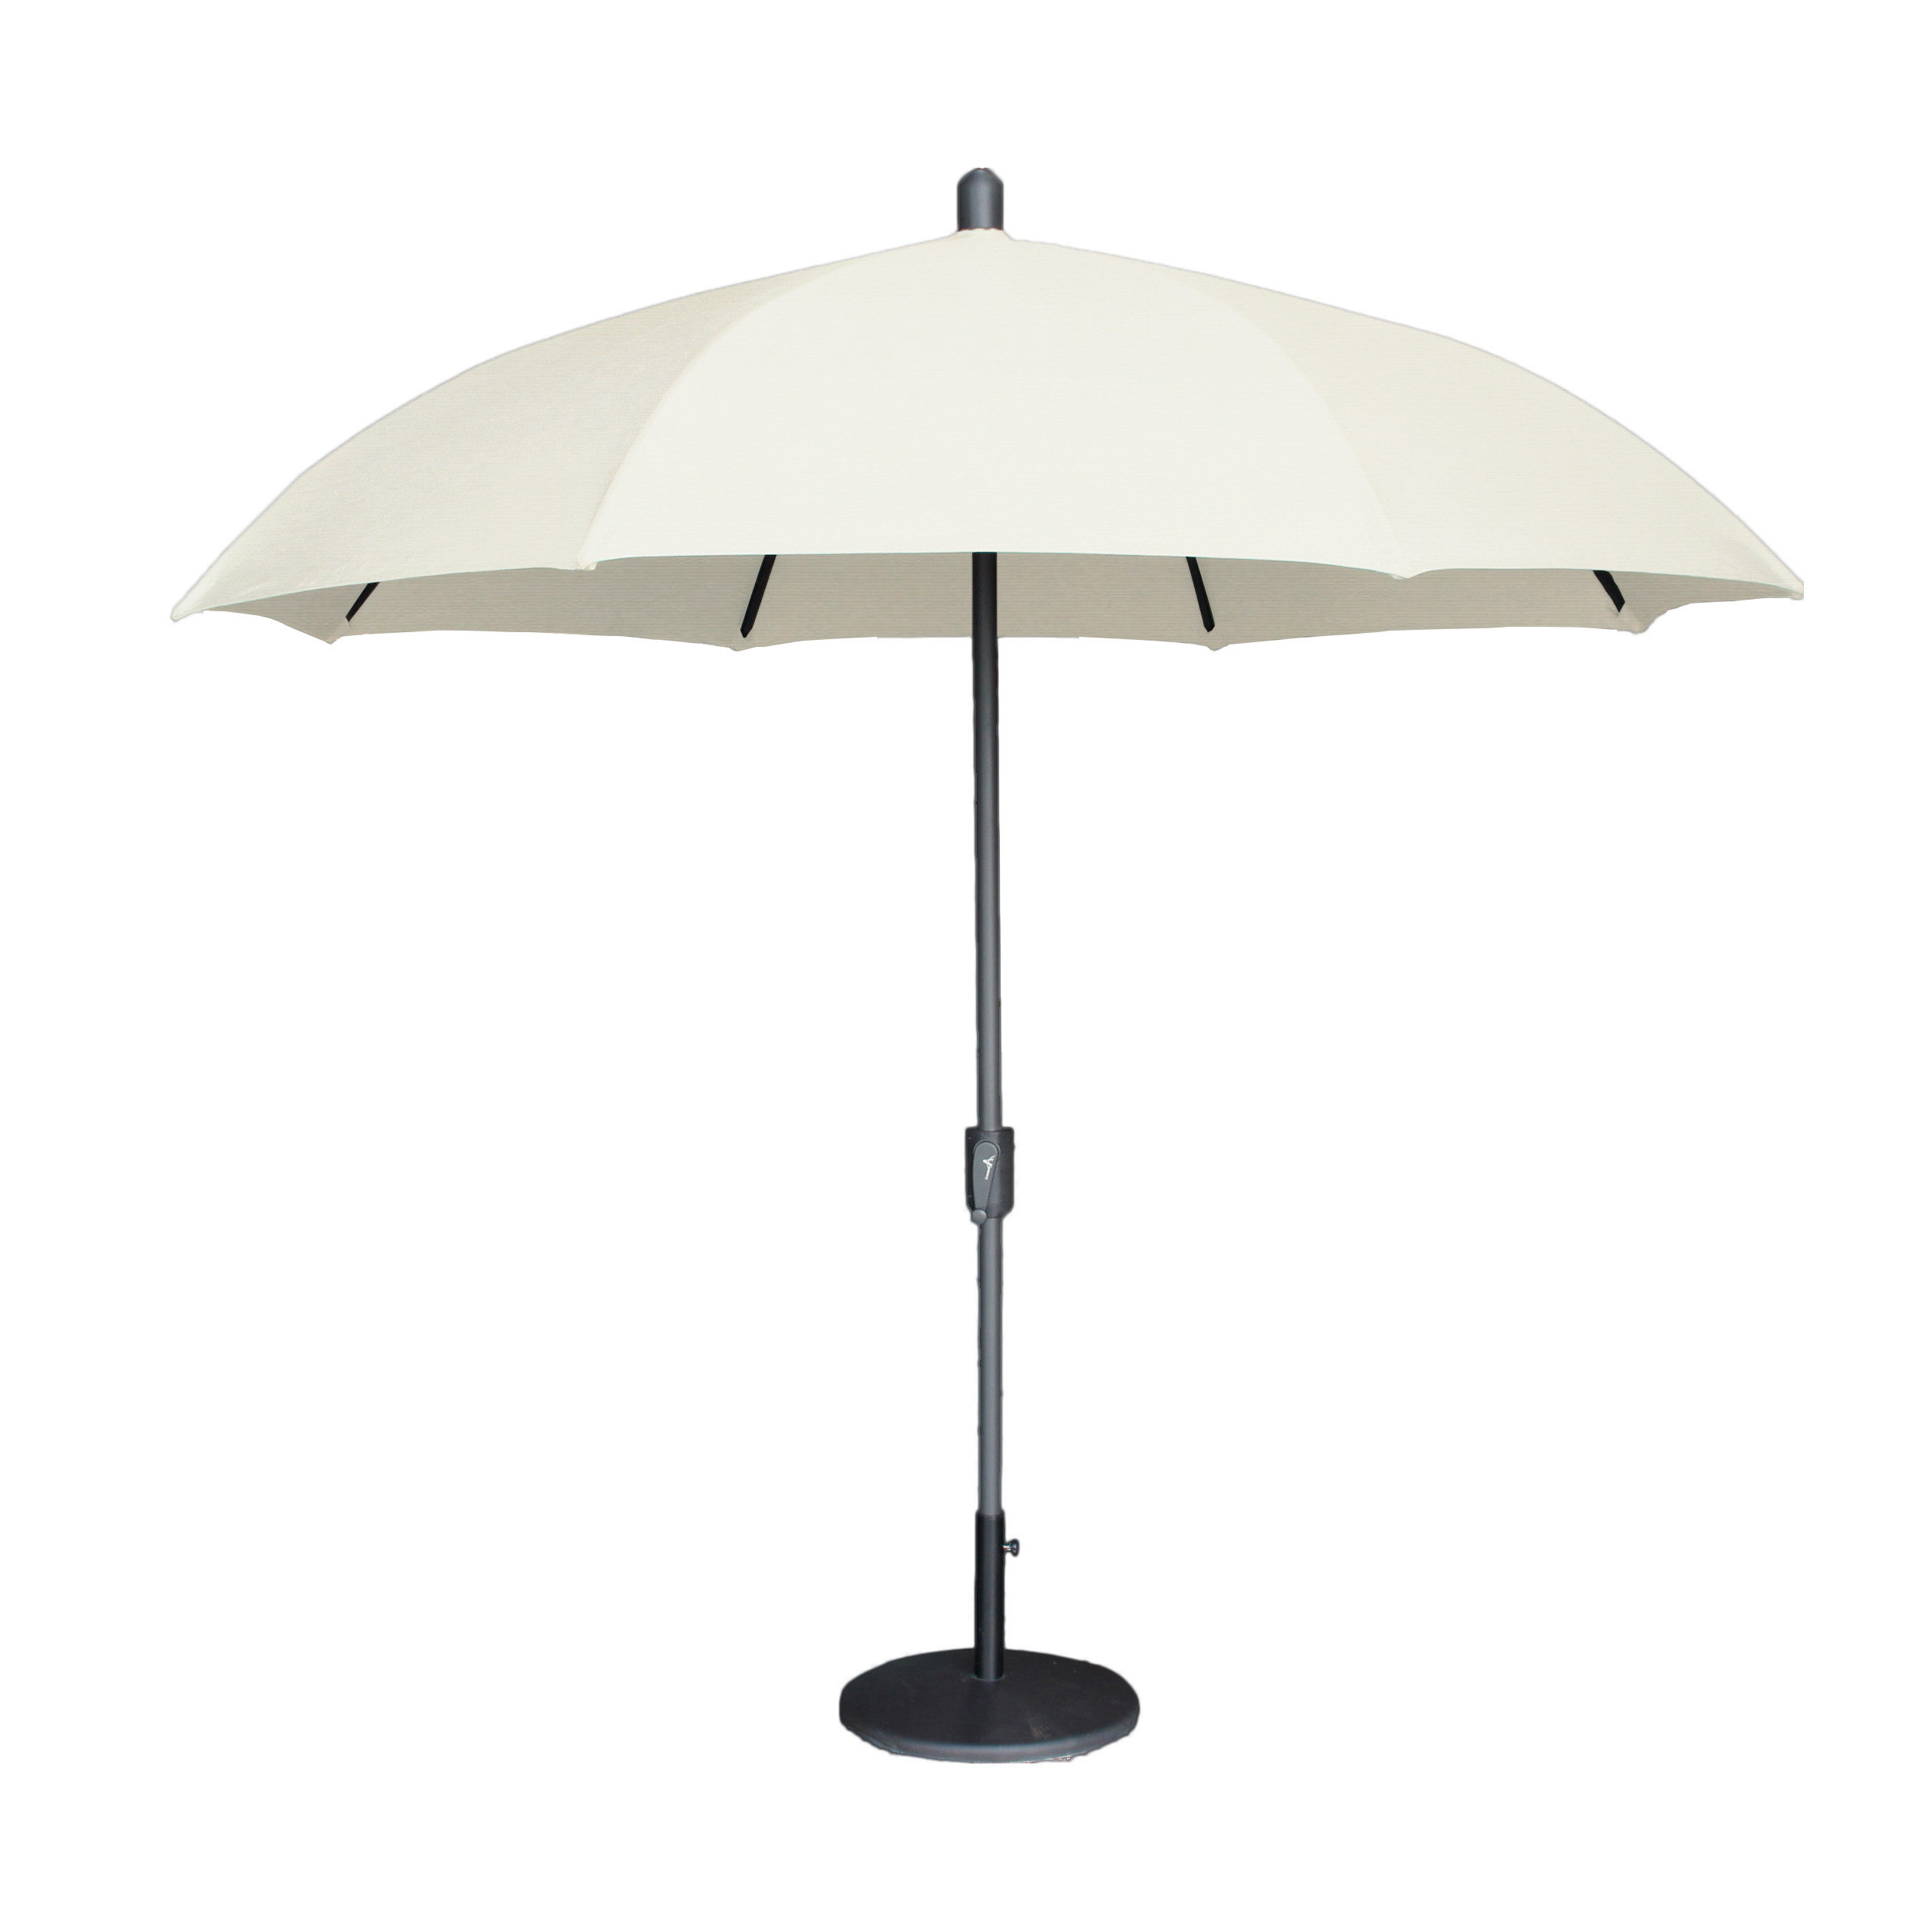 Most Popular Mariam Dome 8.5' Market Sunbrella Umbrella Pertaining To Wiechmann Push Tilt Market Sunbrella Umbrellas (Gallery 13 of 20)